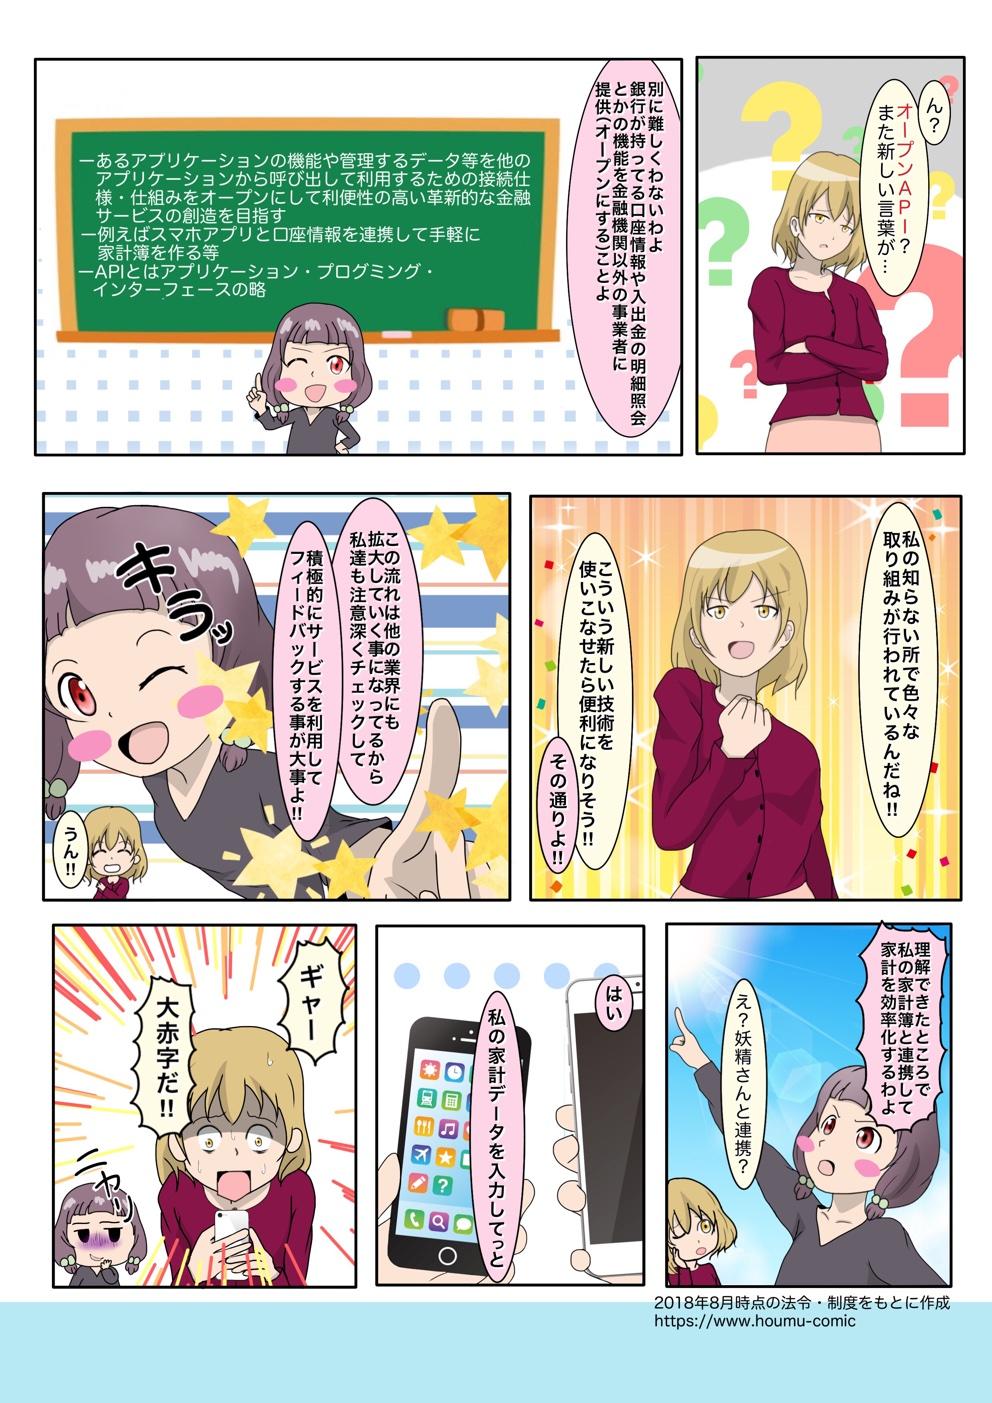 f:id:houmu_comic:20180820211037j:plain